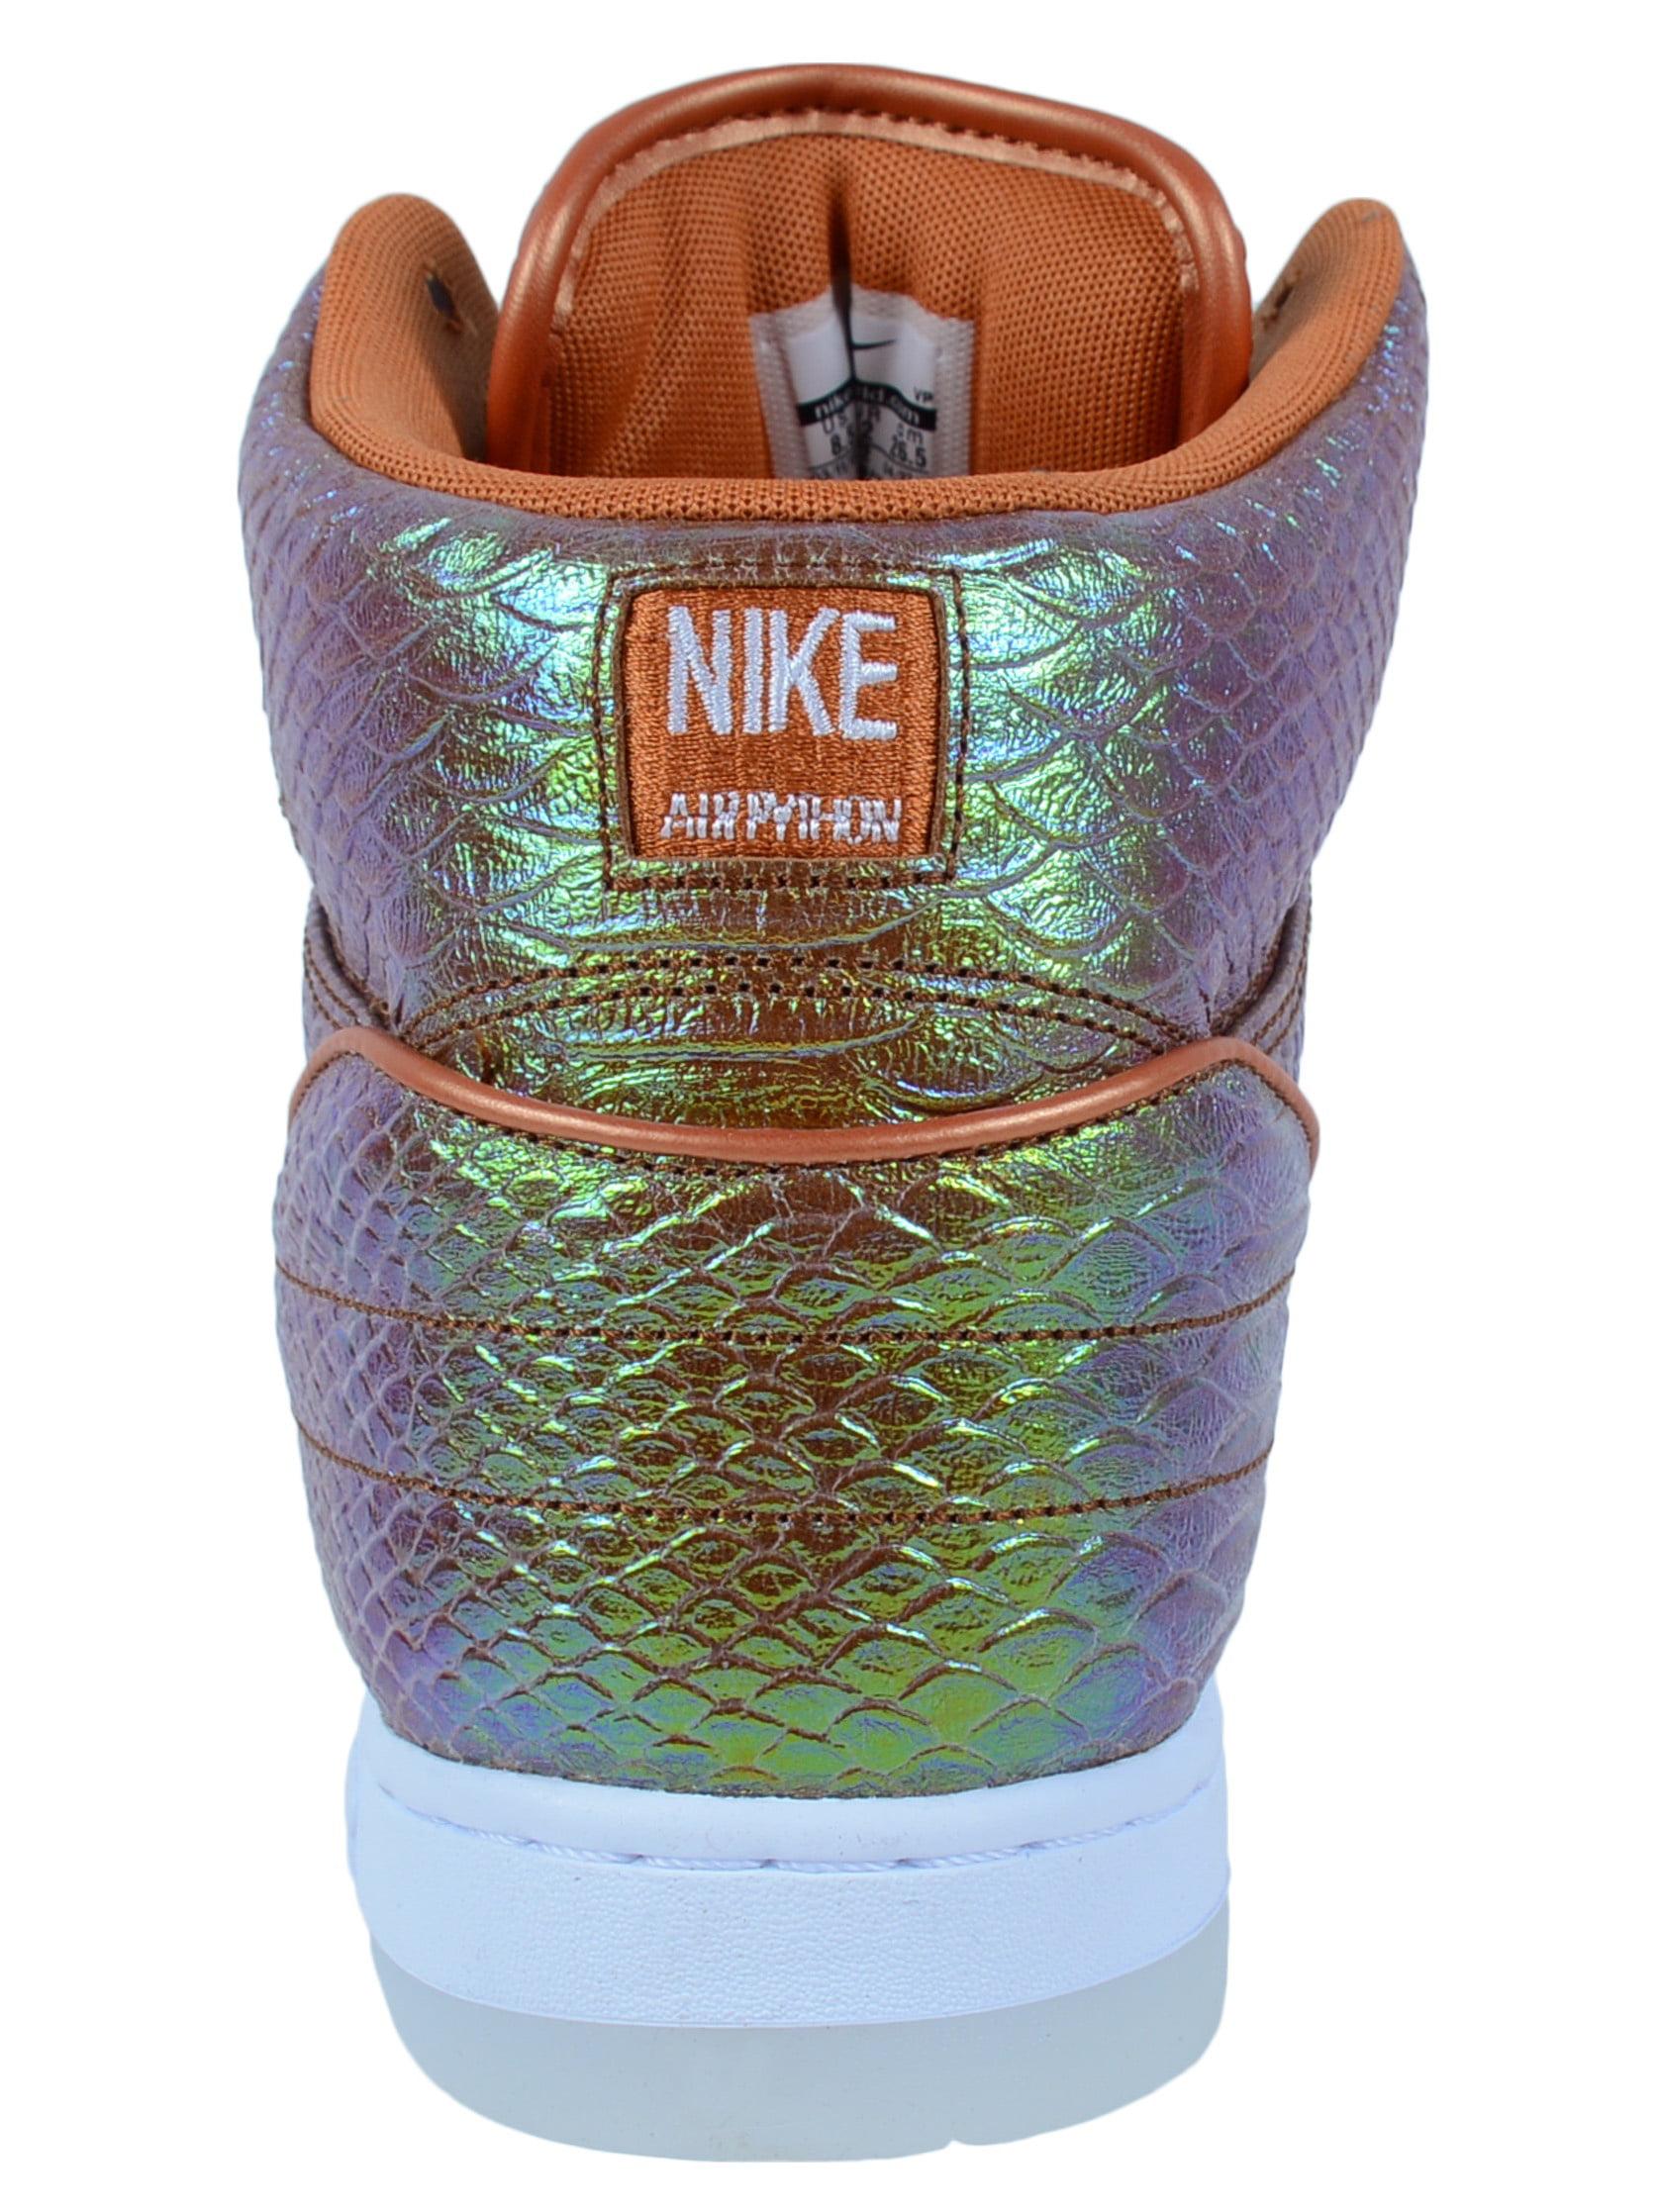 5670466f8aa Nike - NIKE AIR PYTHON PRM  IRIDESCENT  FASHION SNEAKERS TAWNY METALLIC  705066 202 - Walmart.com